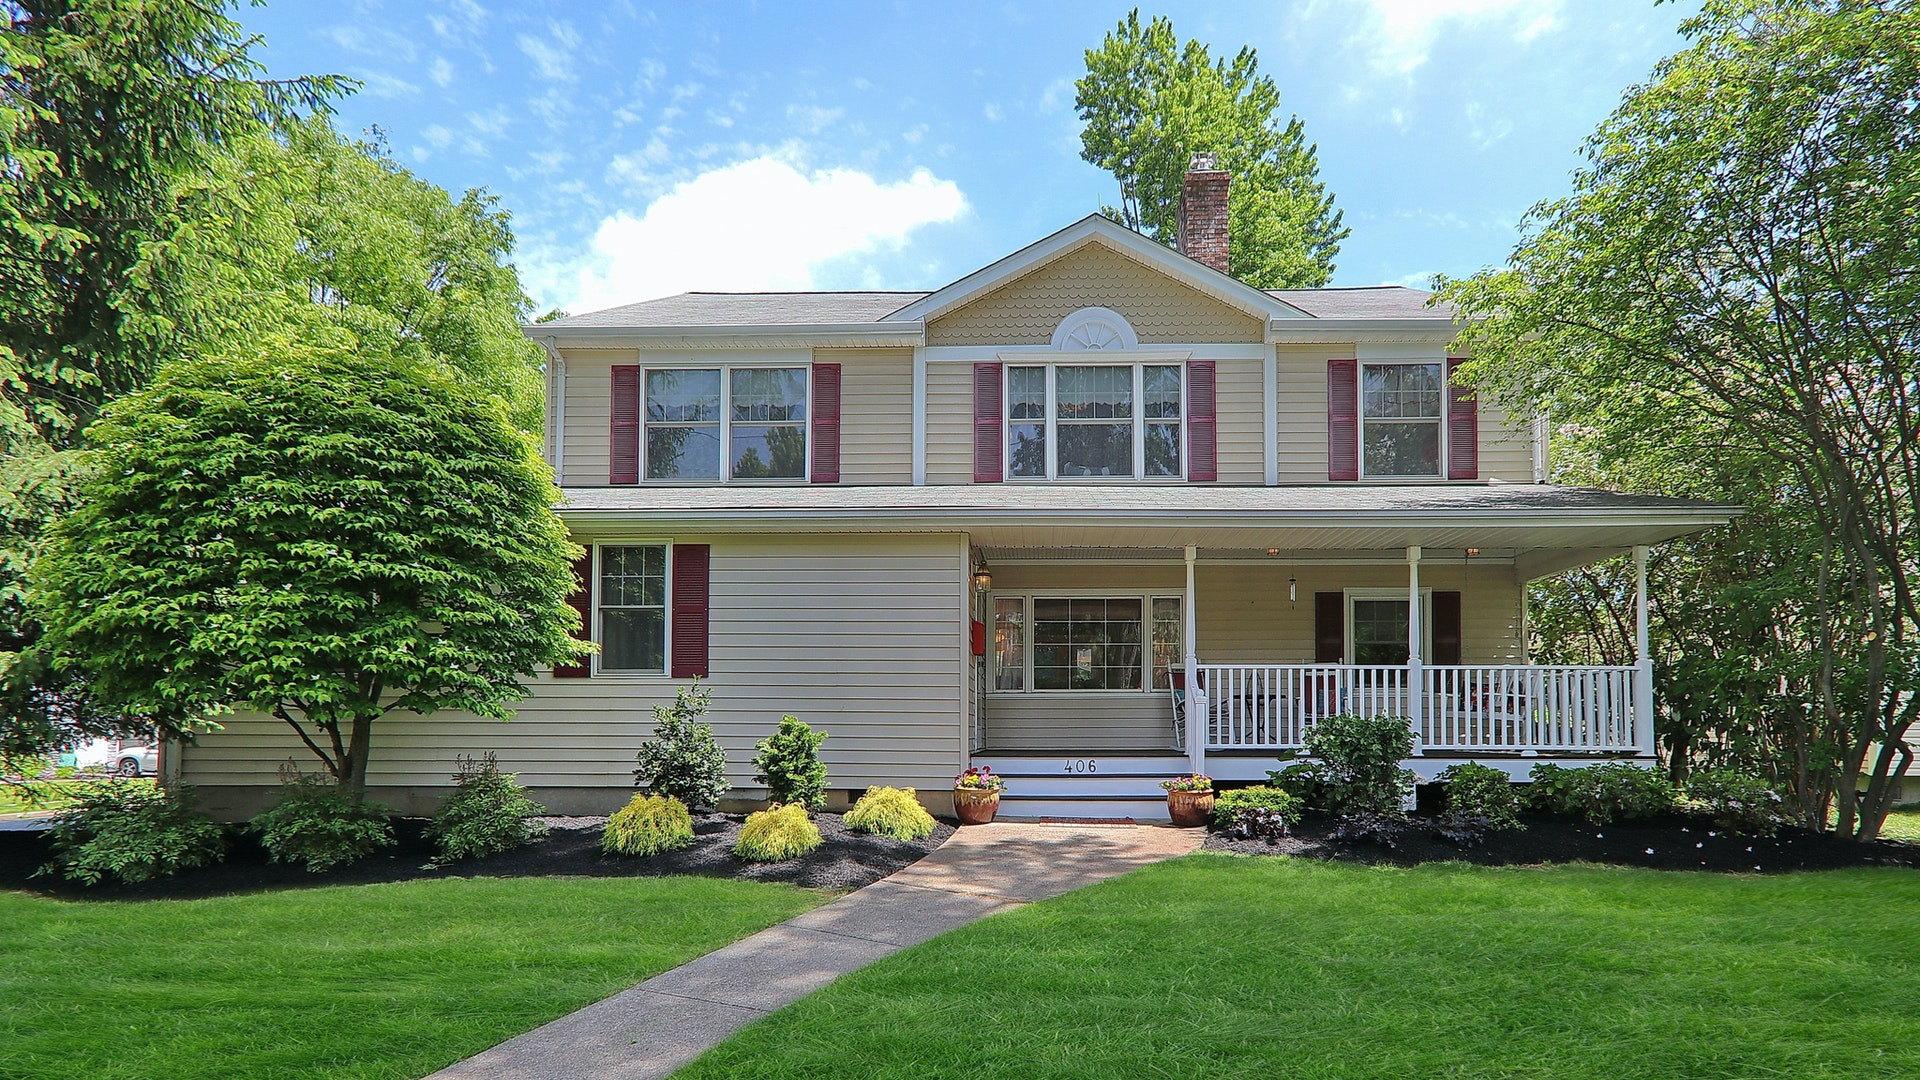 406 Claremont Place, Cranford <br /> Sold $795,000